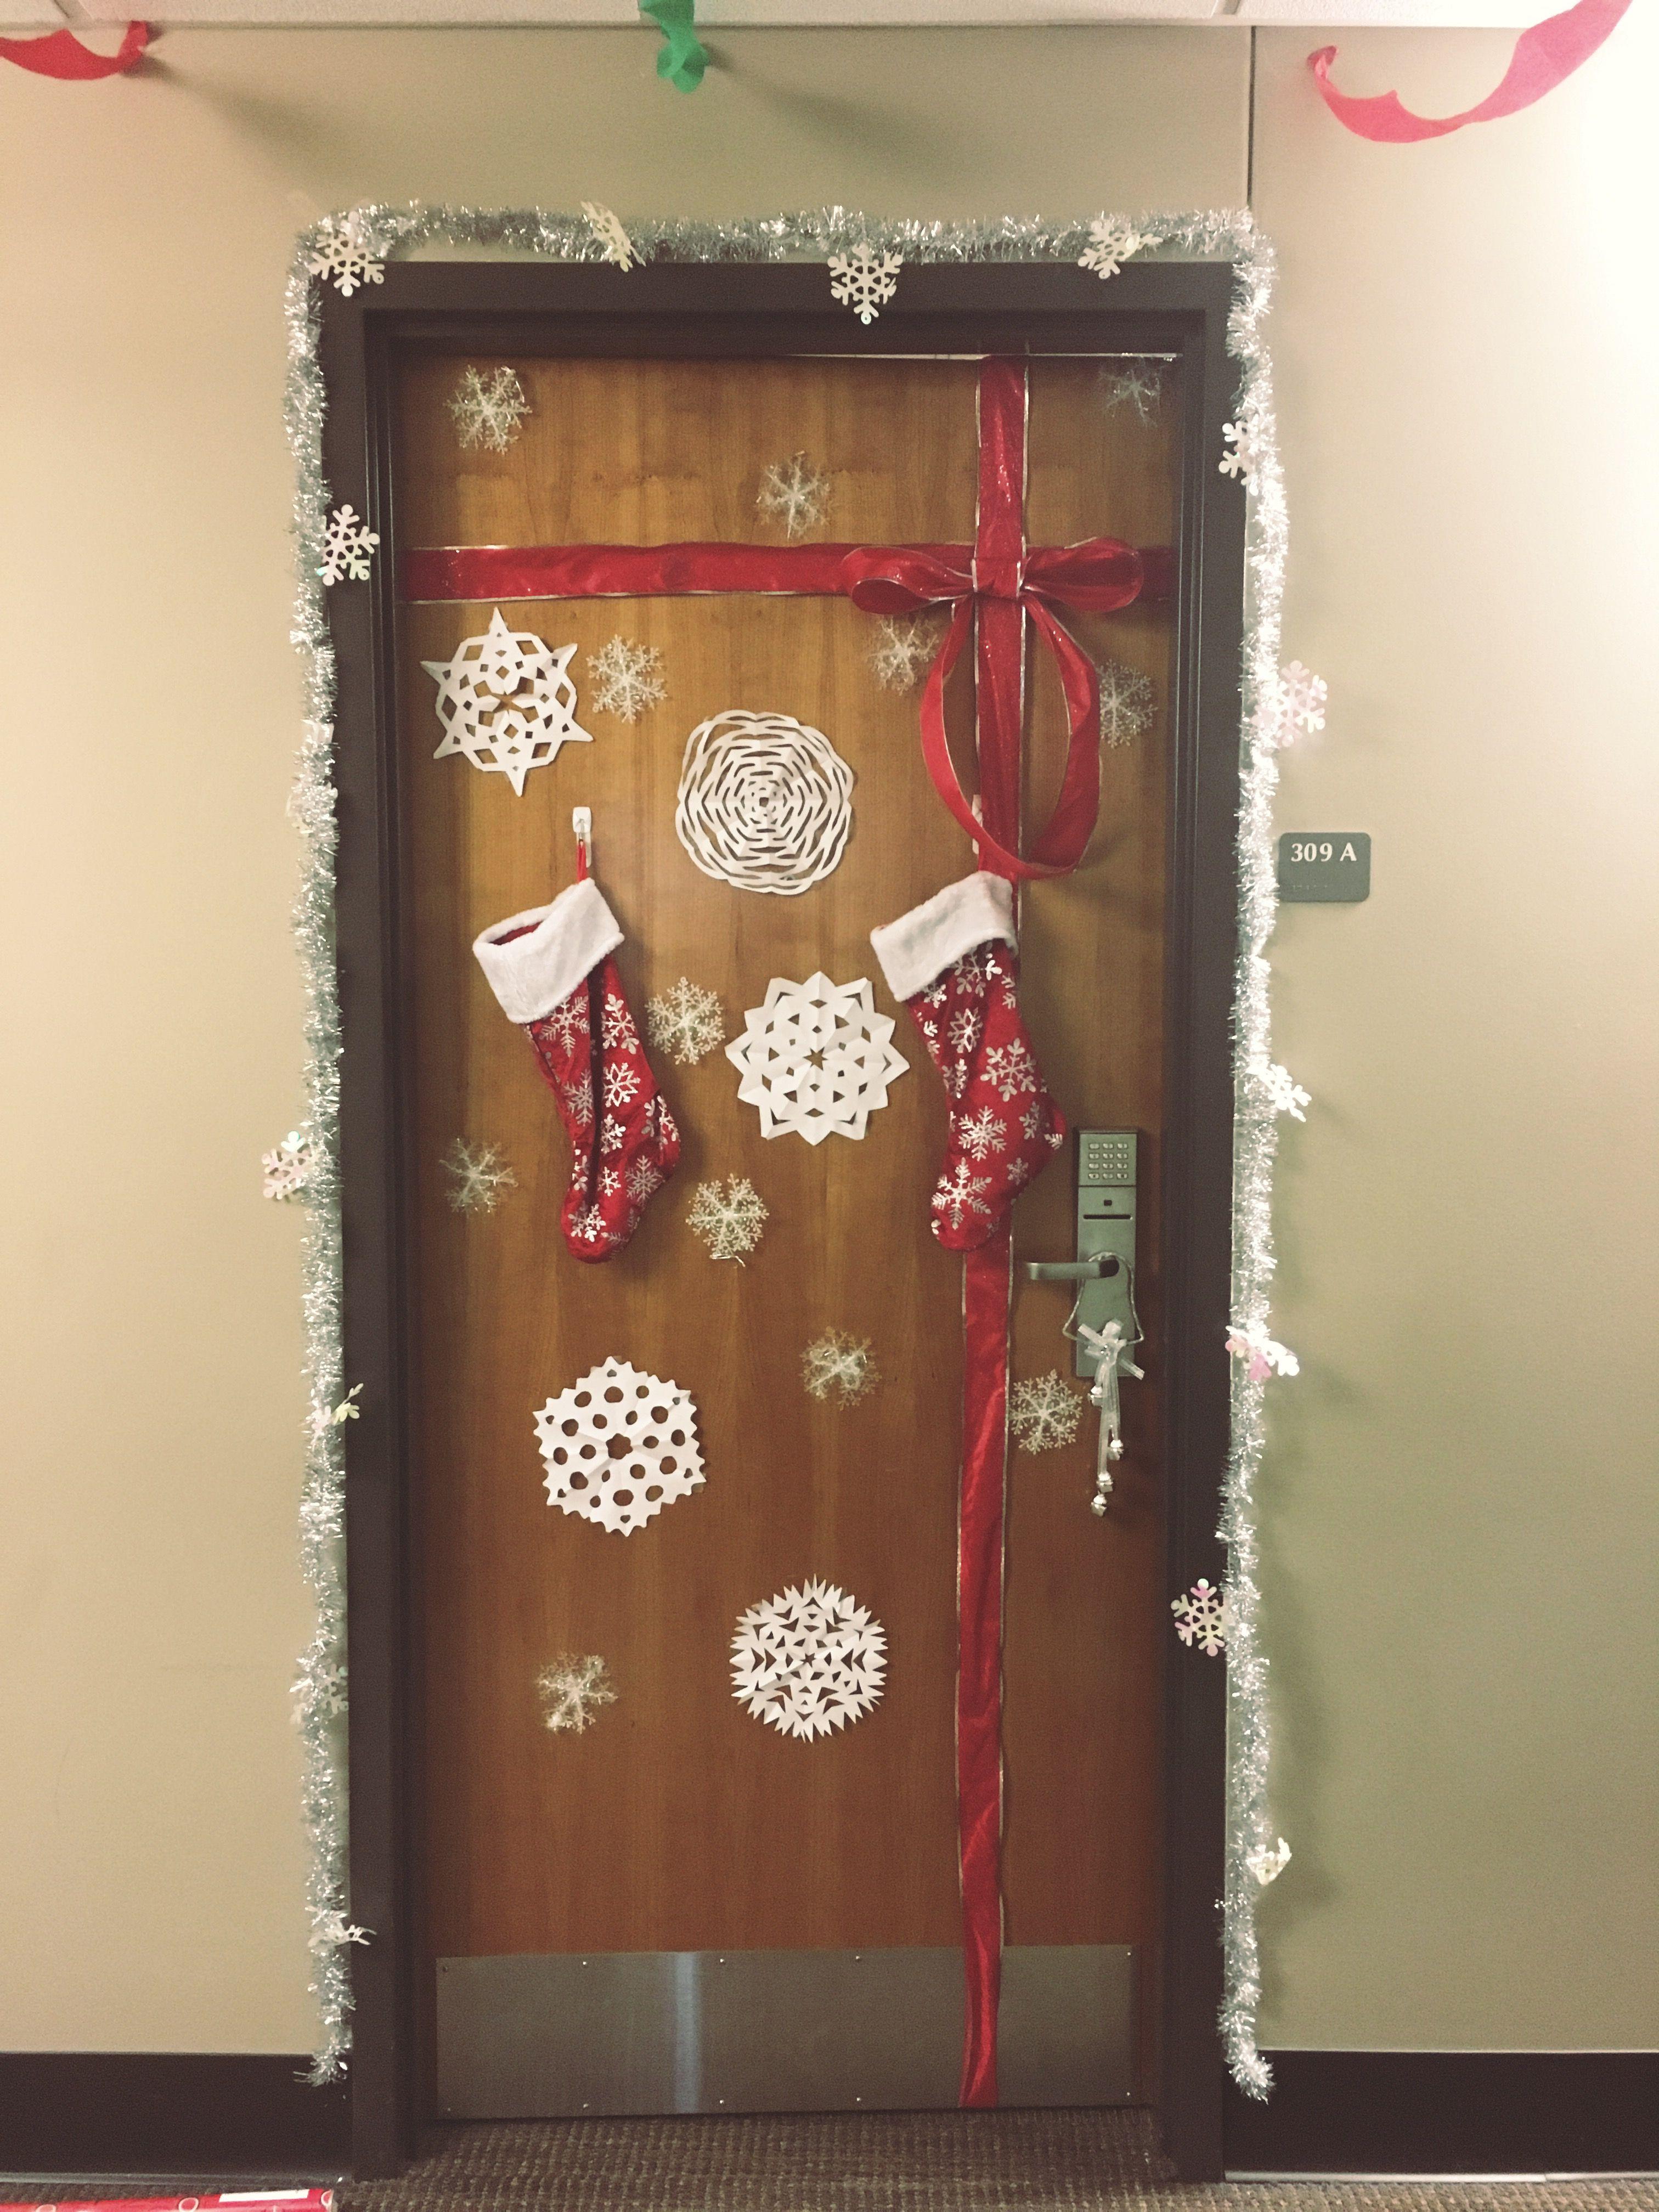 Medium Crop Of Cool Dorm Door Decorations